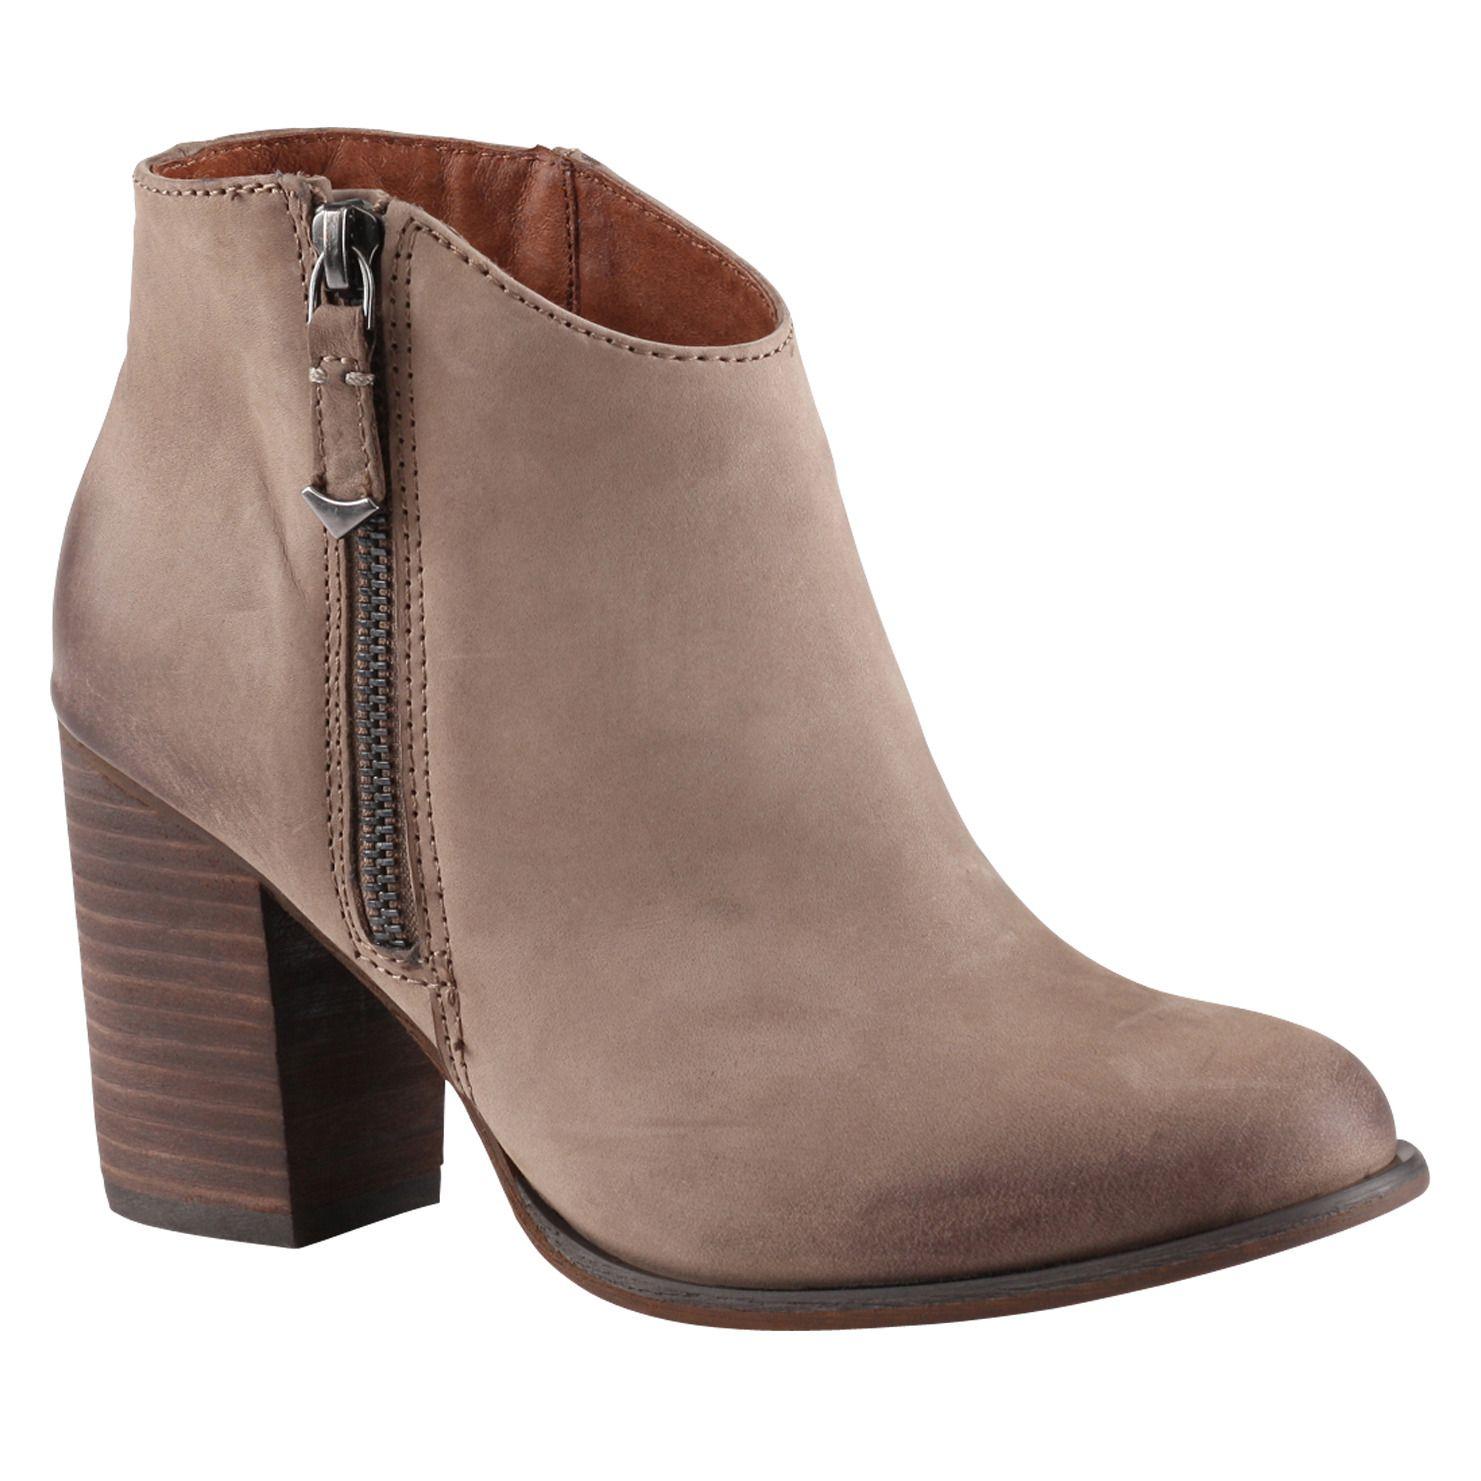 RUSOVA - women s ankle boots boots for sale at ALDO Shoes.  790175d18a3c